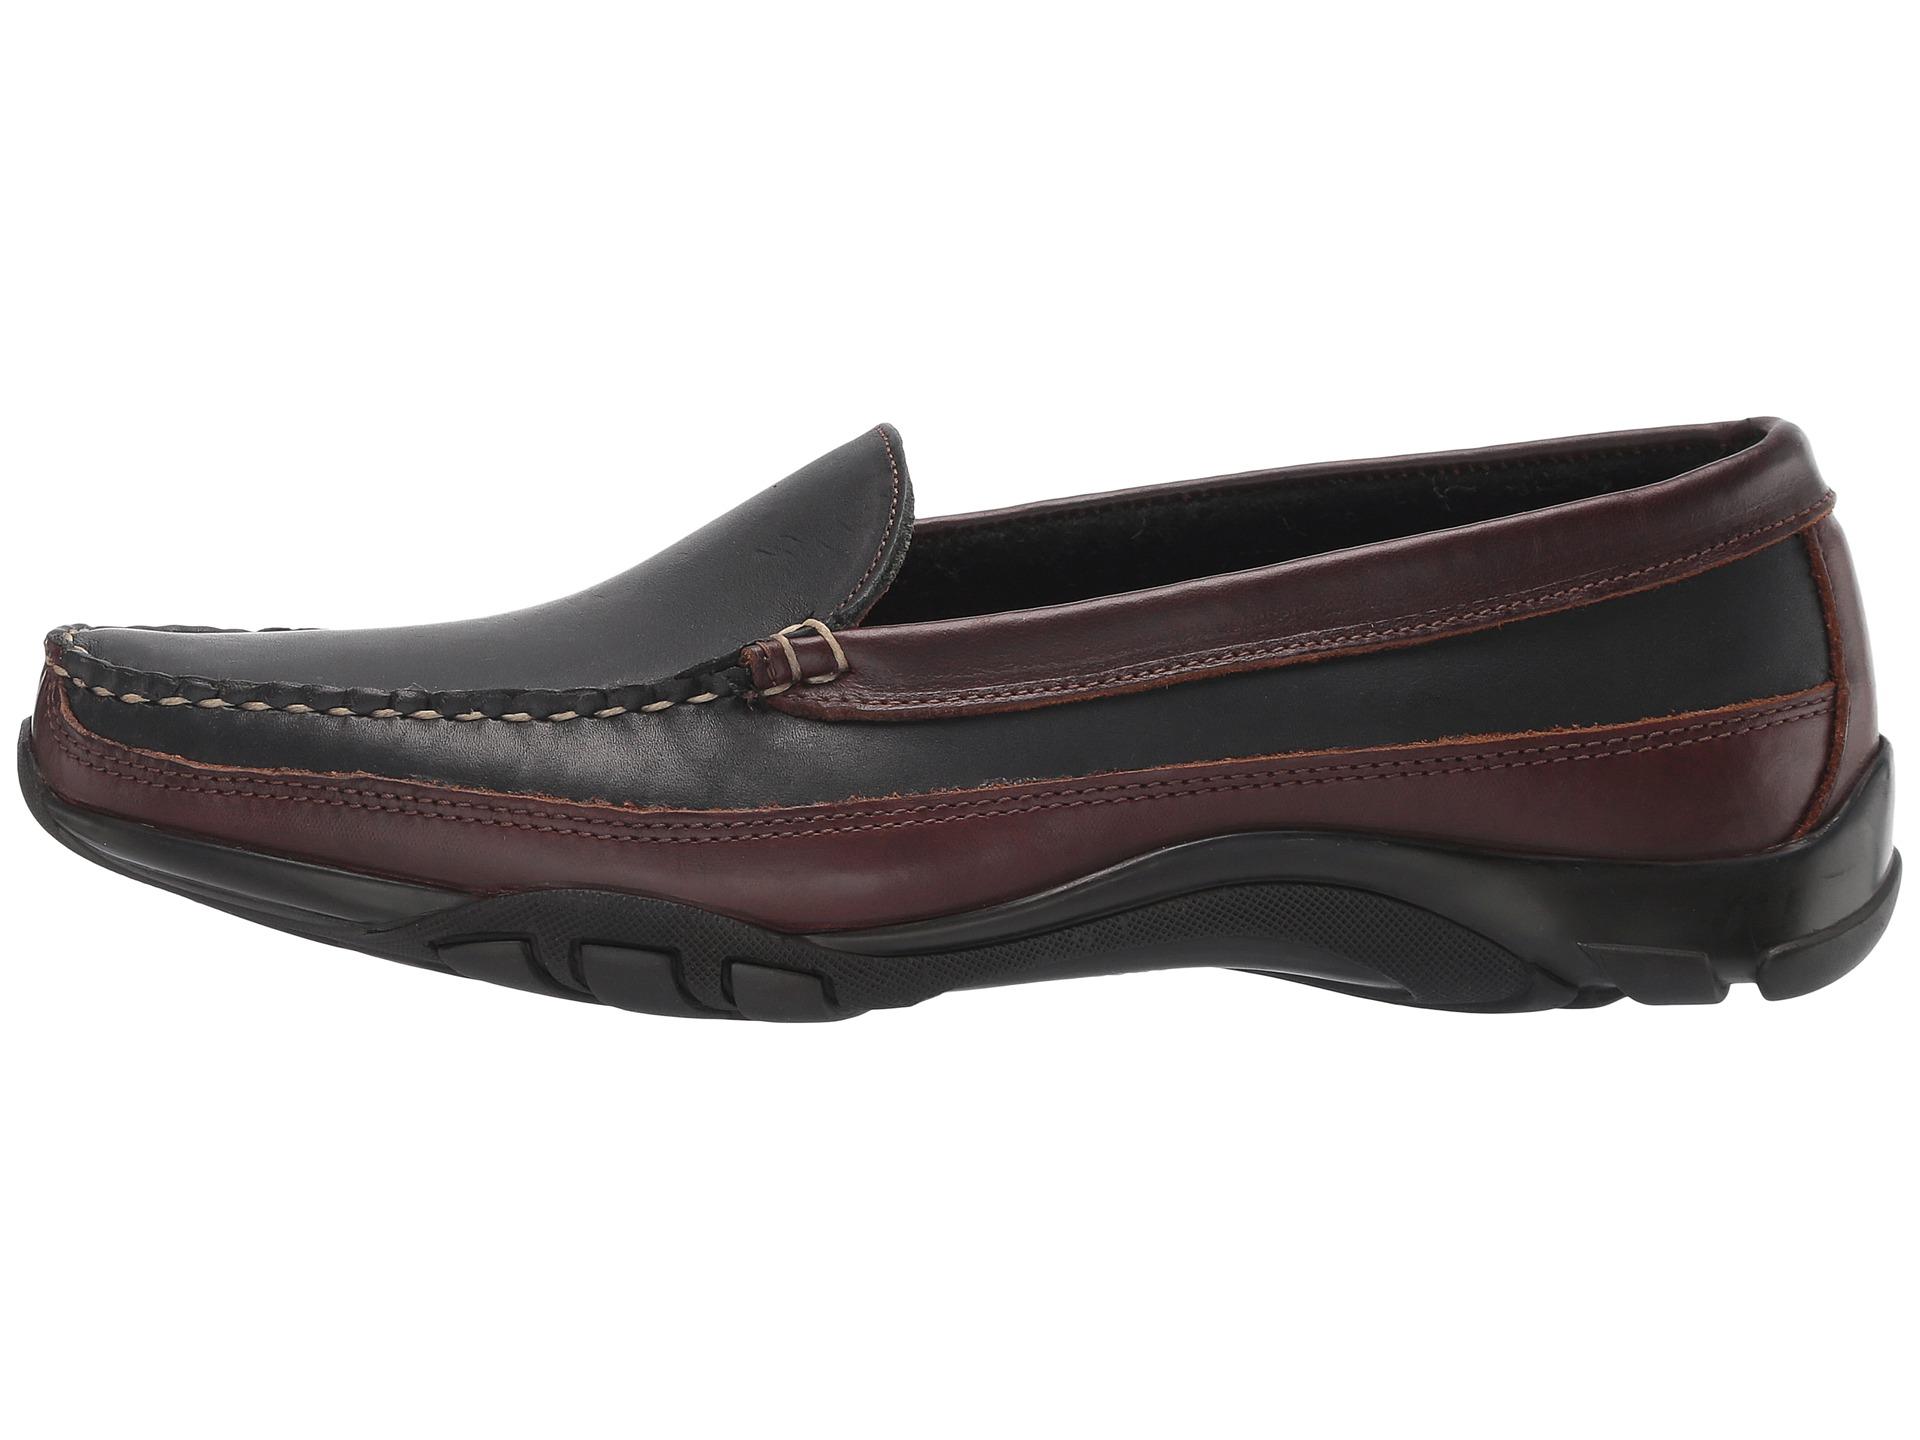 Allen edmonds boulder black saddle leather brown trim zappos com